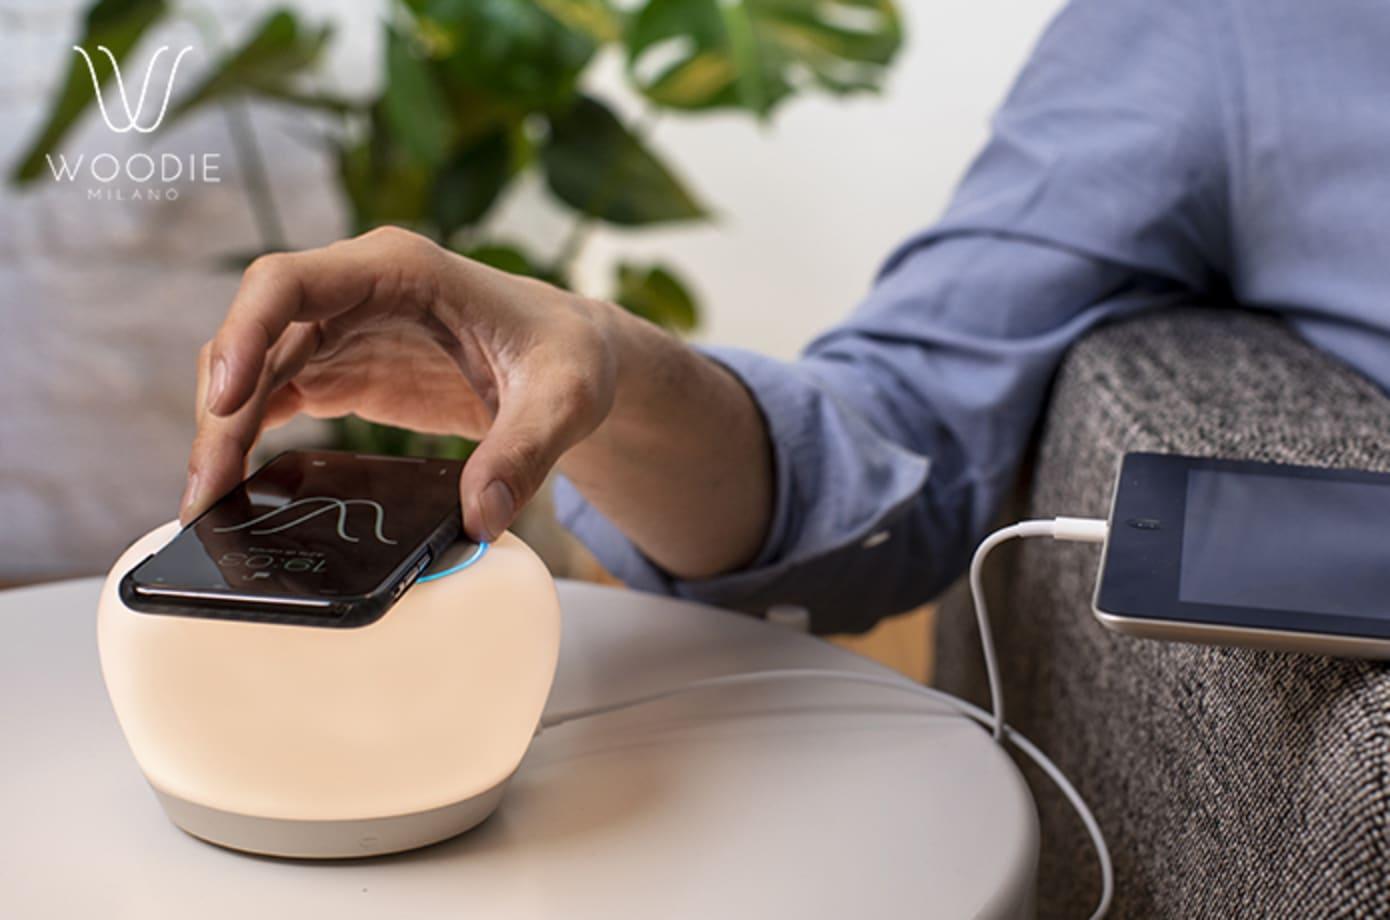 Qiワイヤレス充電+Bluetoothスピーカー+Alexa+LEDランプでデスクの上もスッキリ「Luna Smart Lamp」